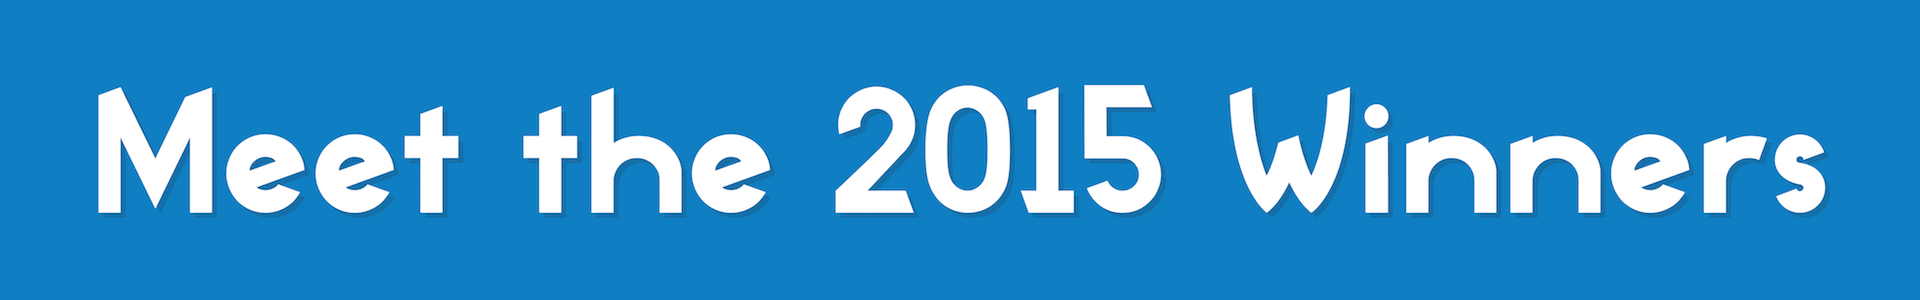 Meet the 2015 Winners